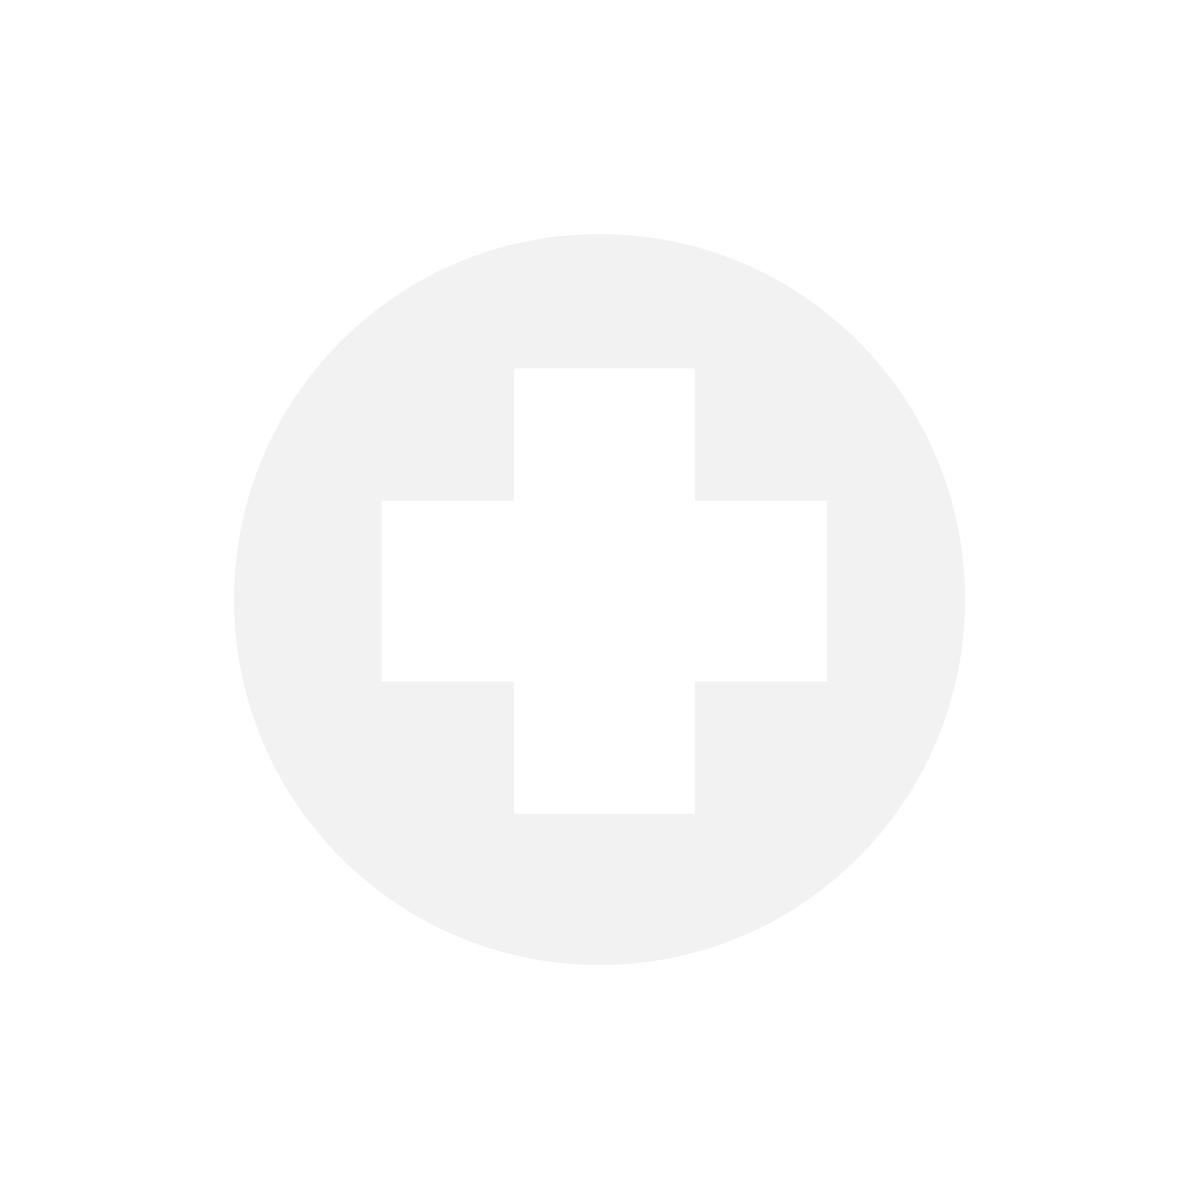 VERRE et QUARTZ Lampe infrarouge 250W de type IRG